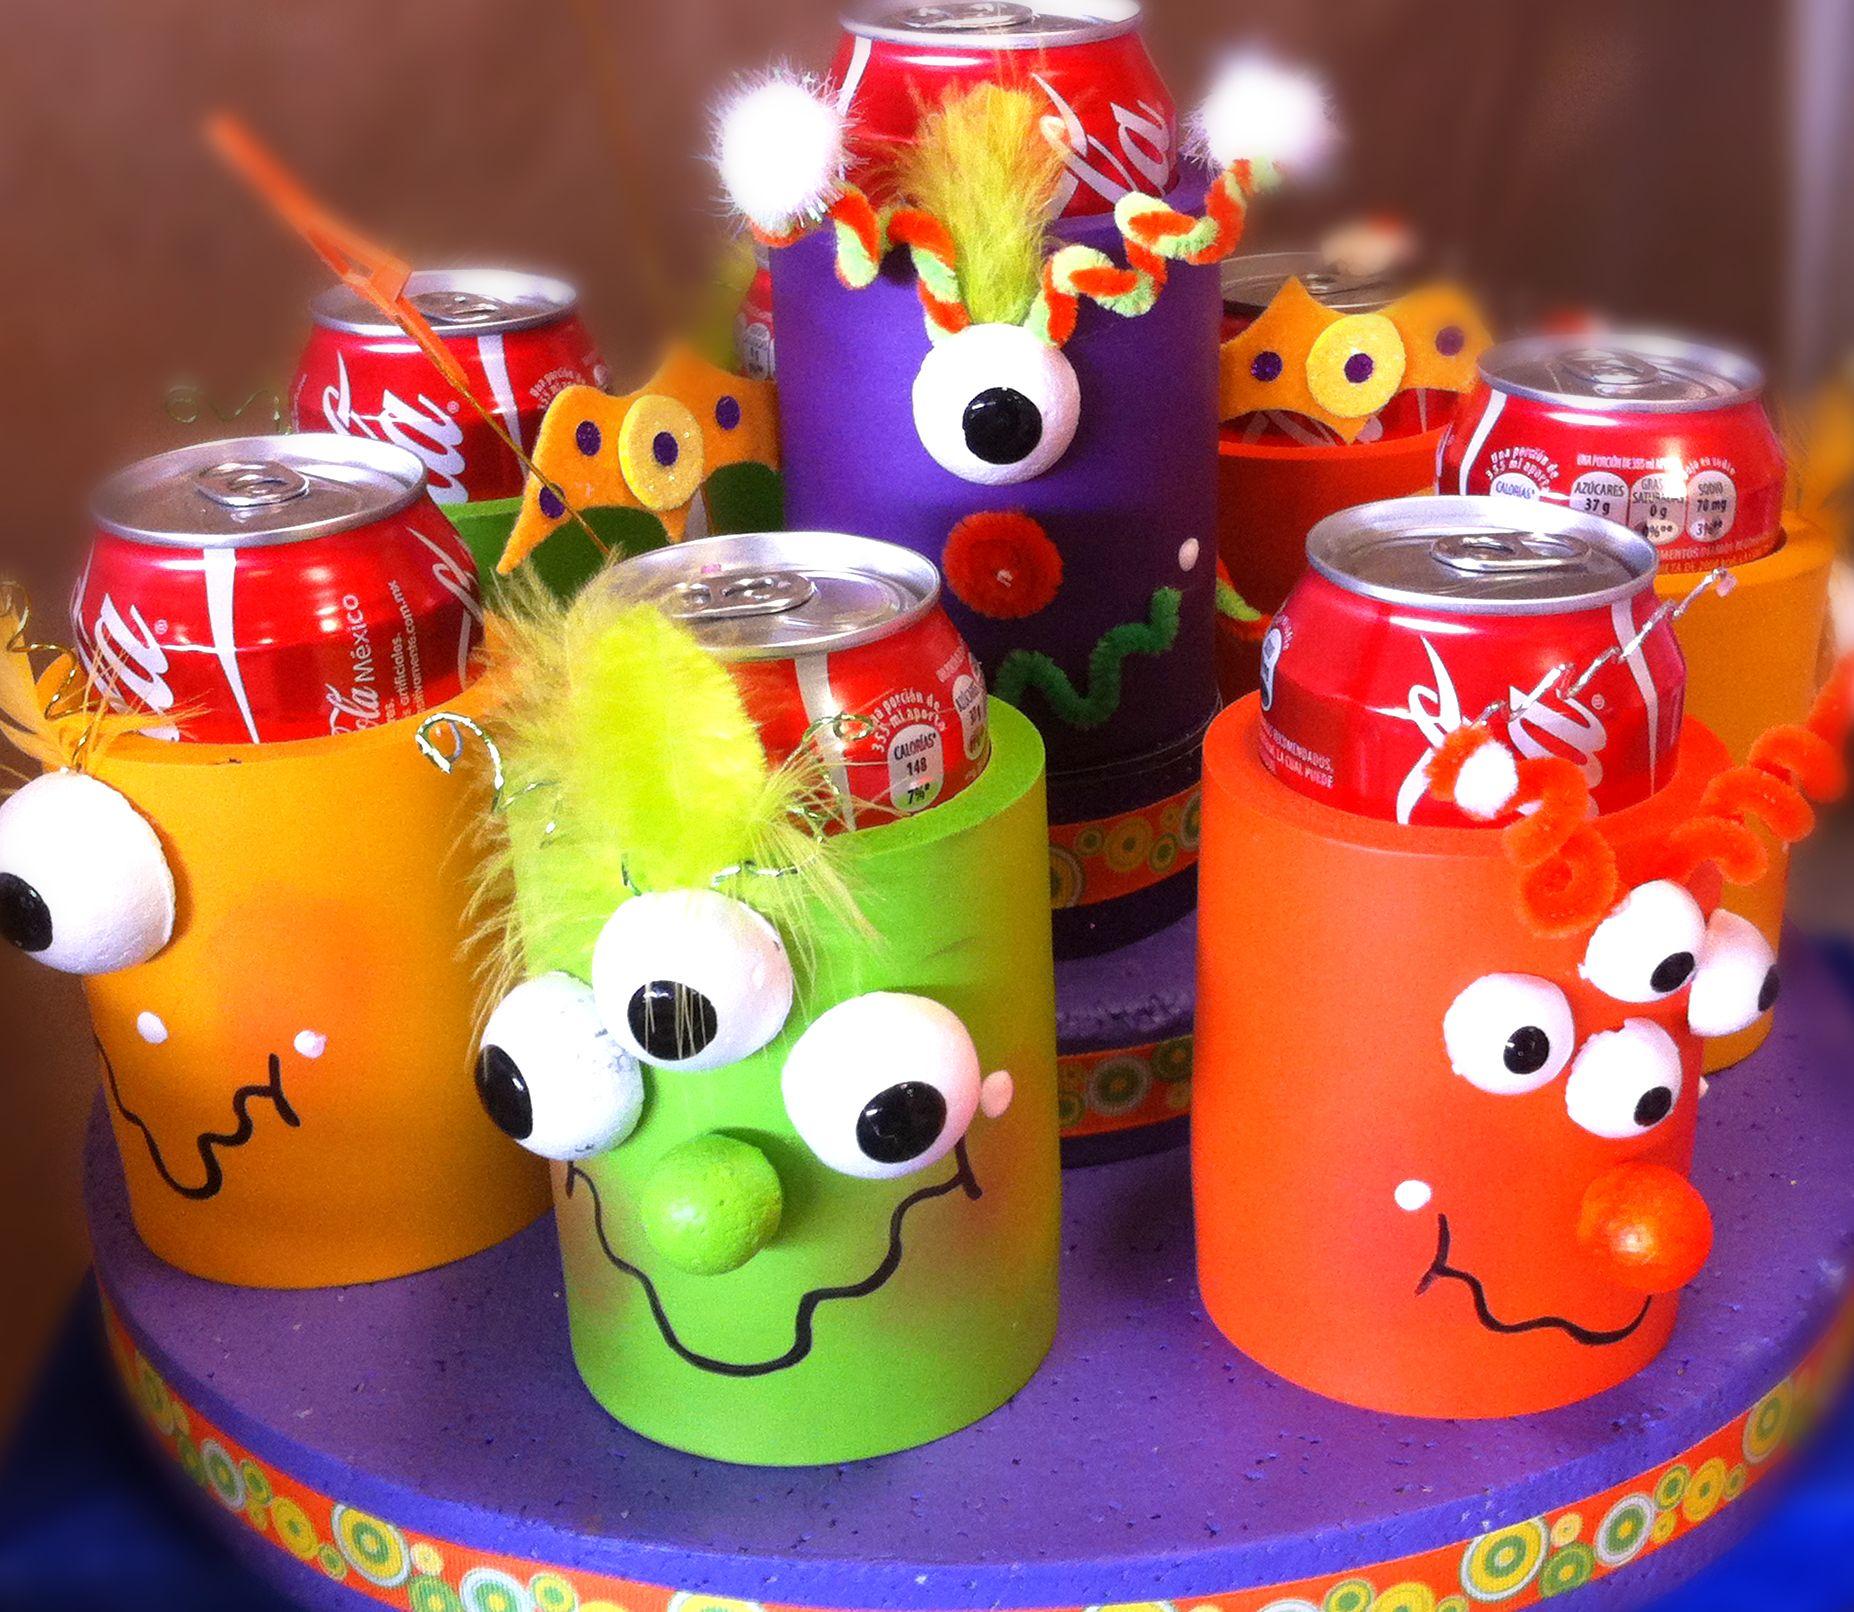 Decoraci n para fiestas infantiles barra de dulces for Decoracion fiesta infantil nina